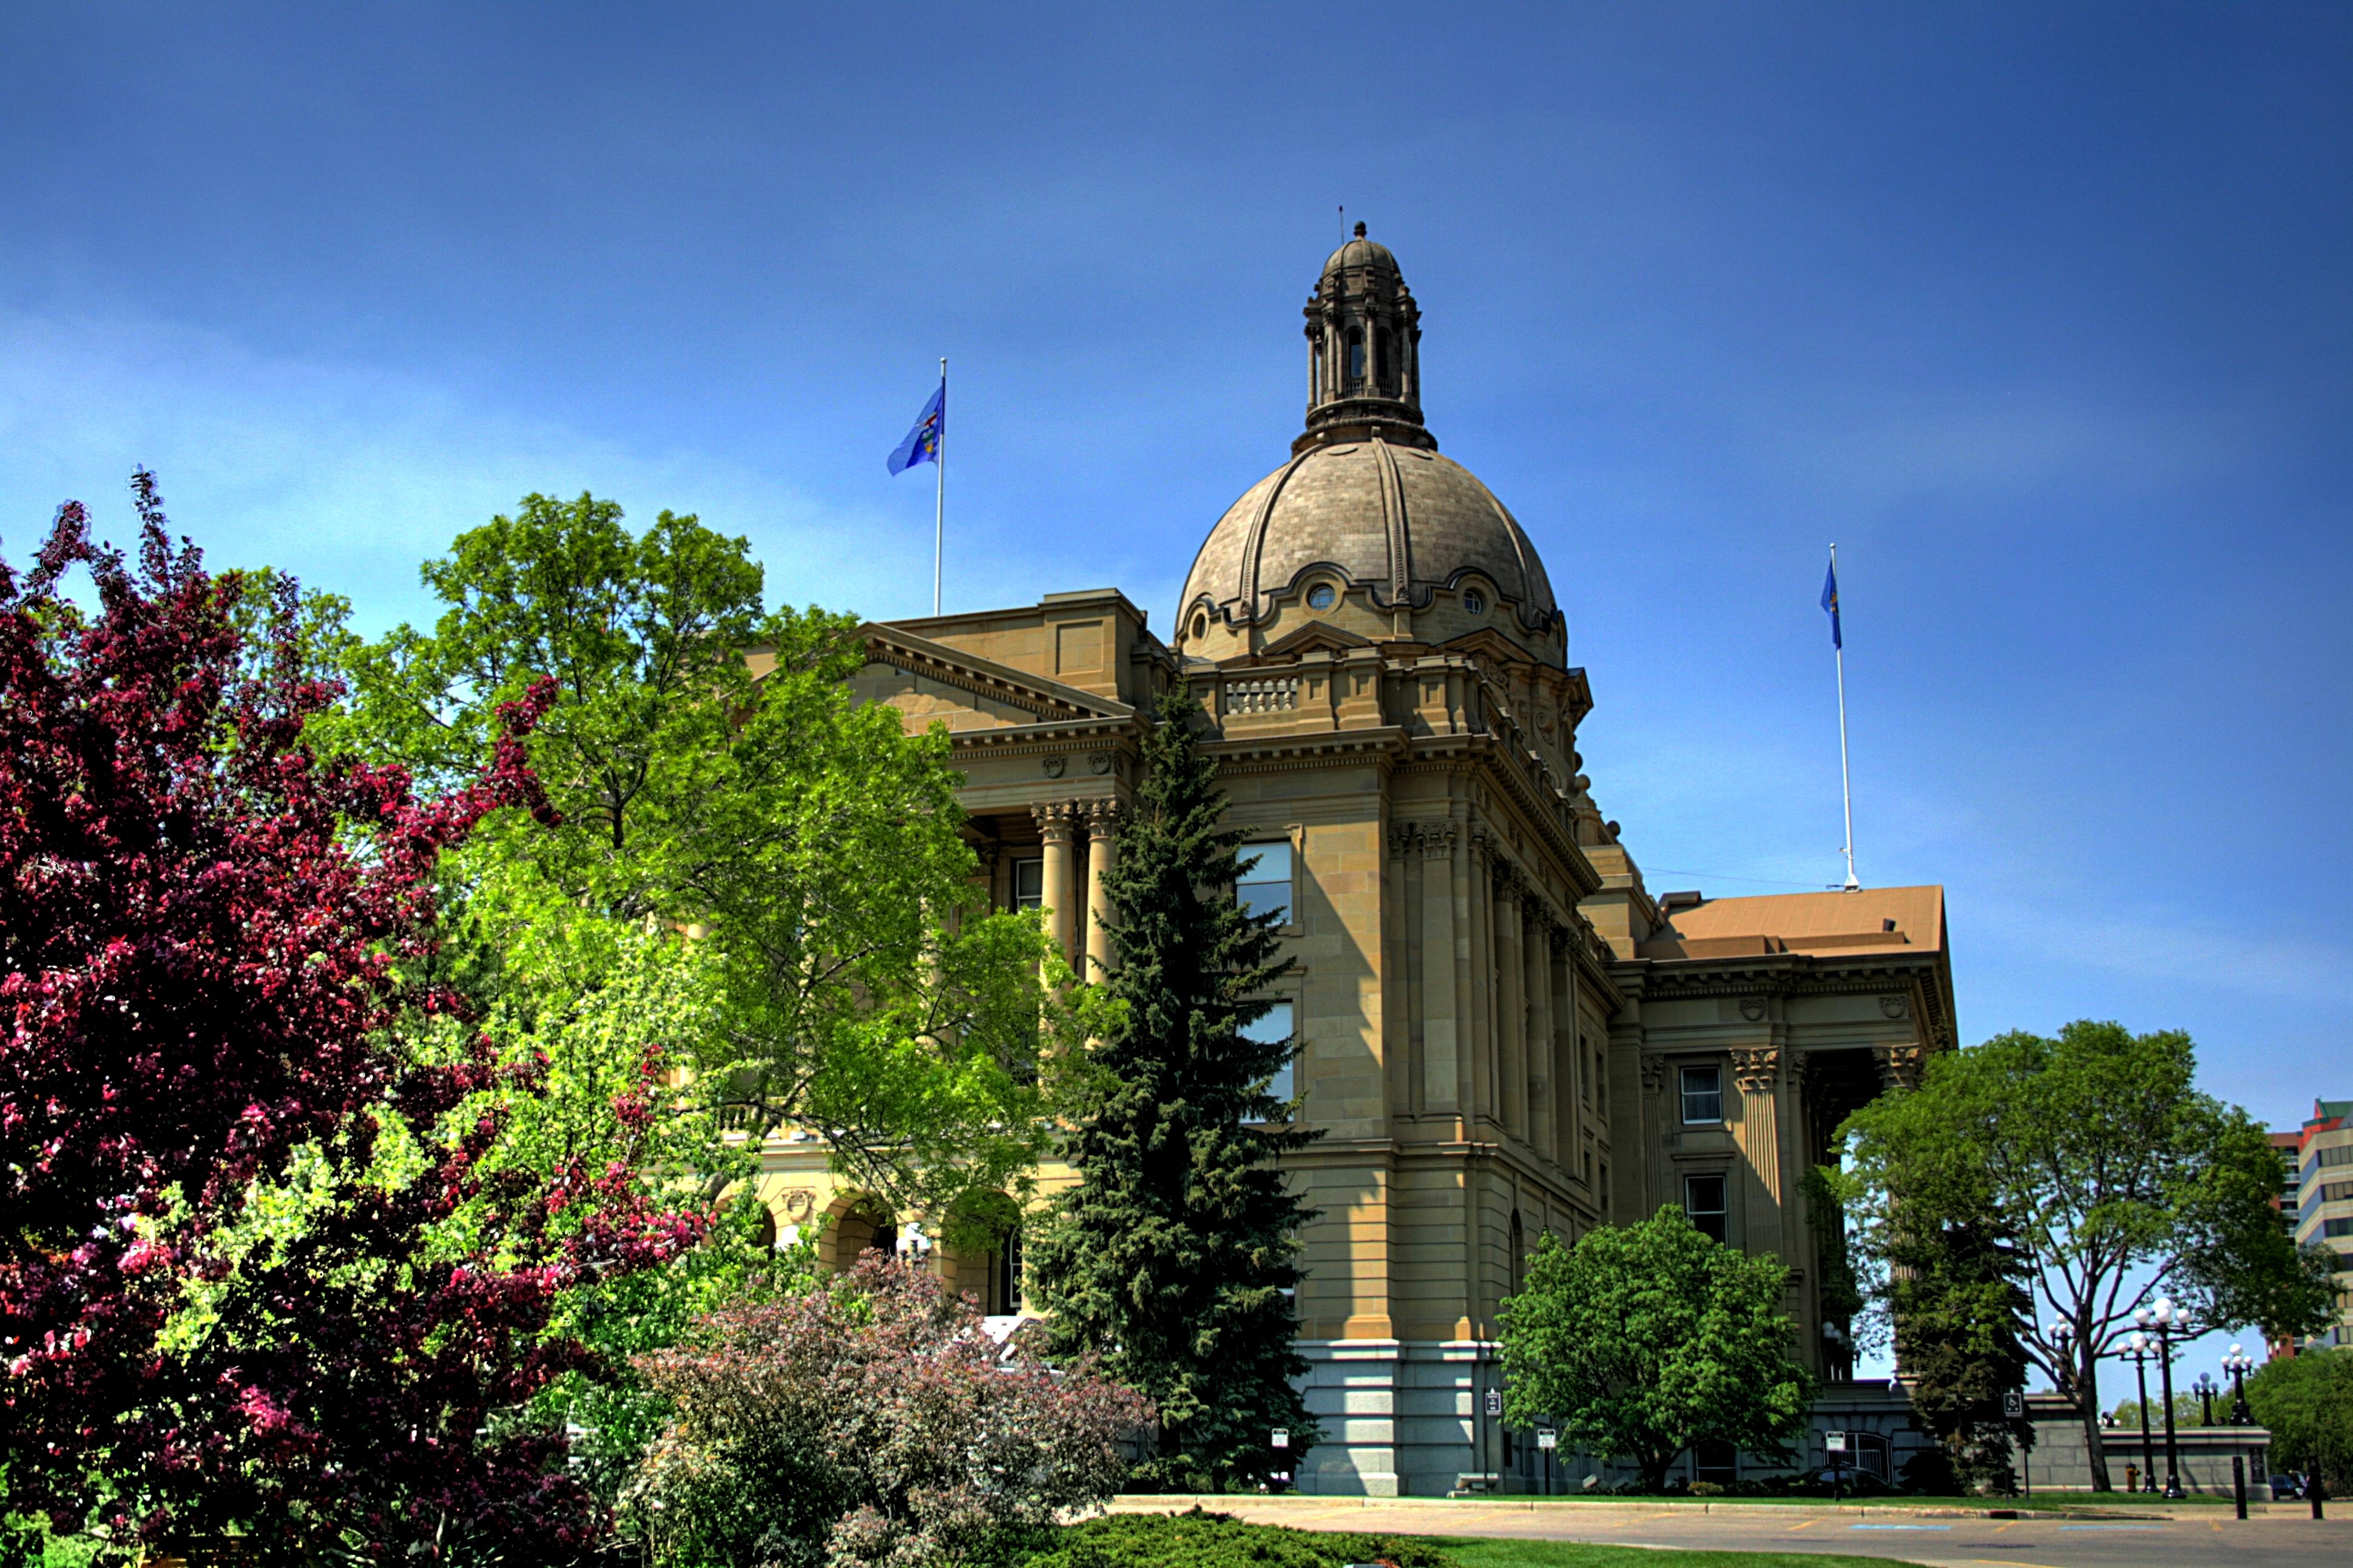 file alberta legislature building 02 a jpg wikimedia commons